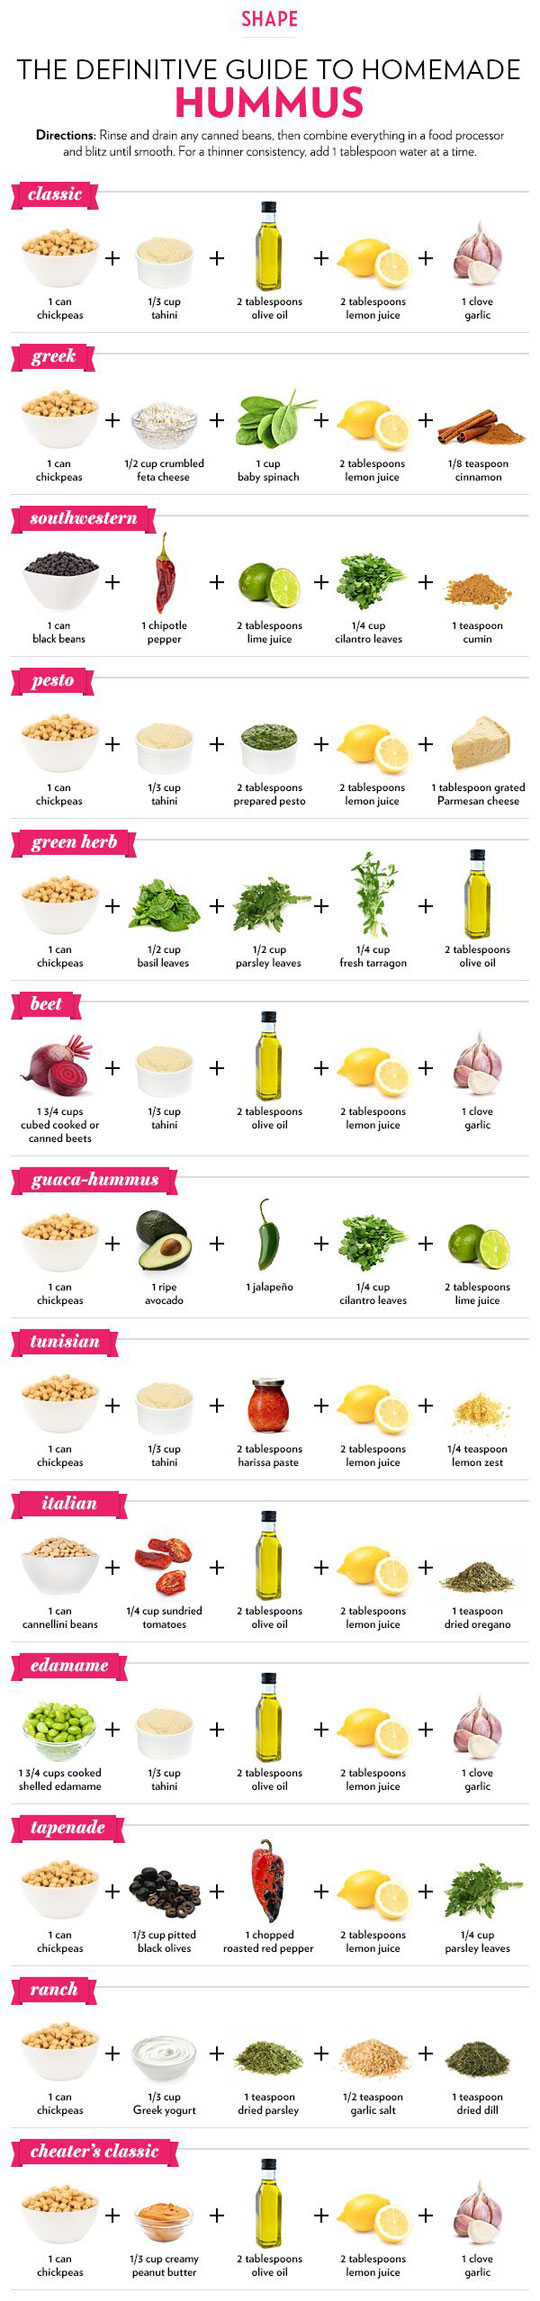 diet-guide-homemade-hummus-food-recipe